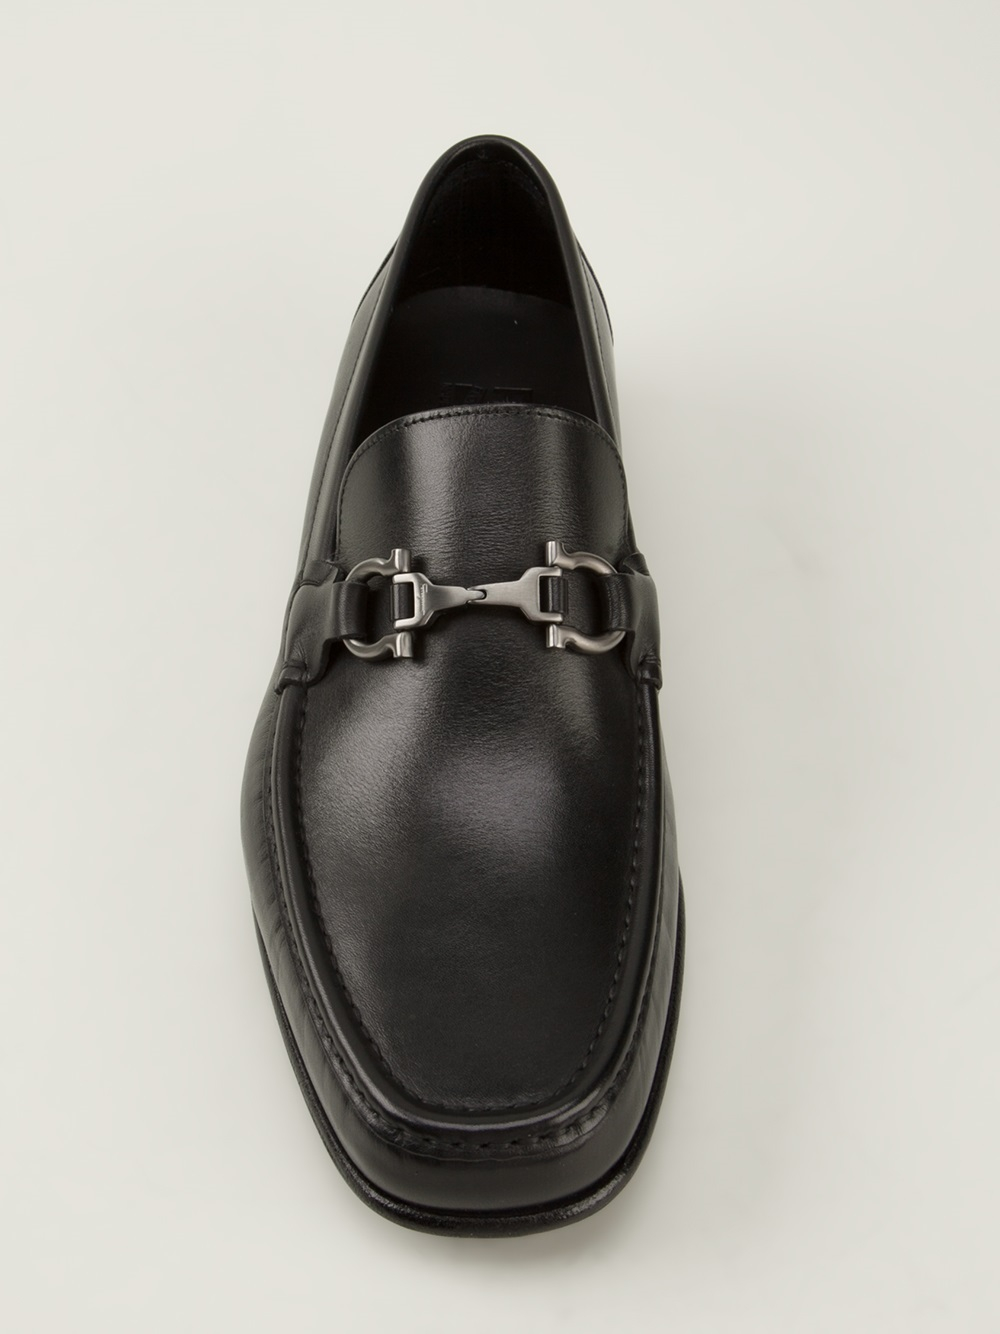 Salvatore FerragamoFlor horsebit loafers LcZqhMCsu1